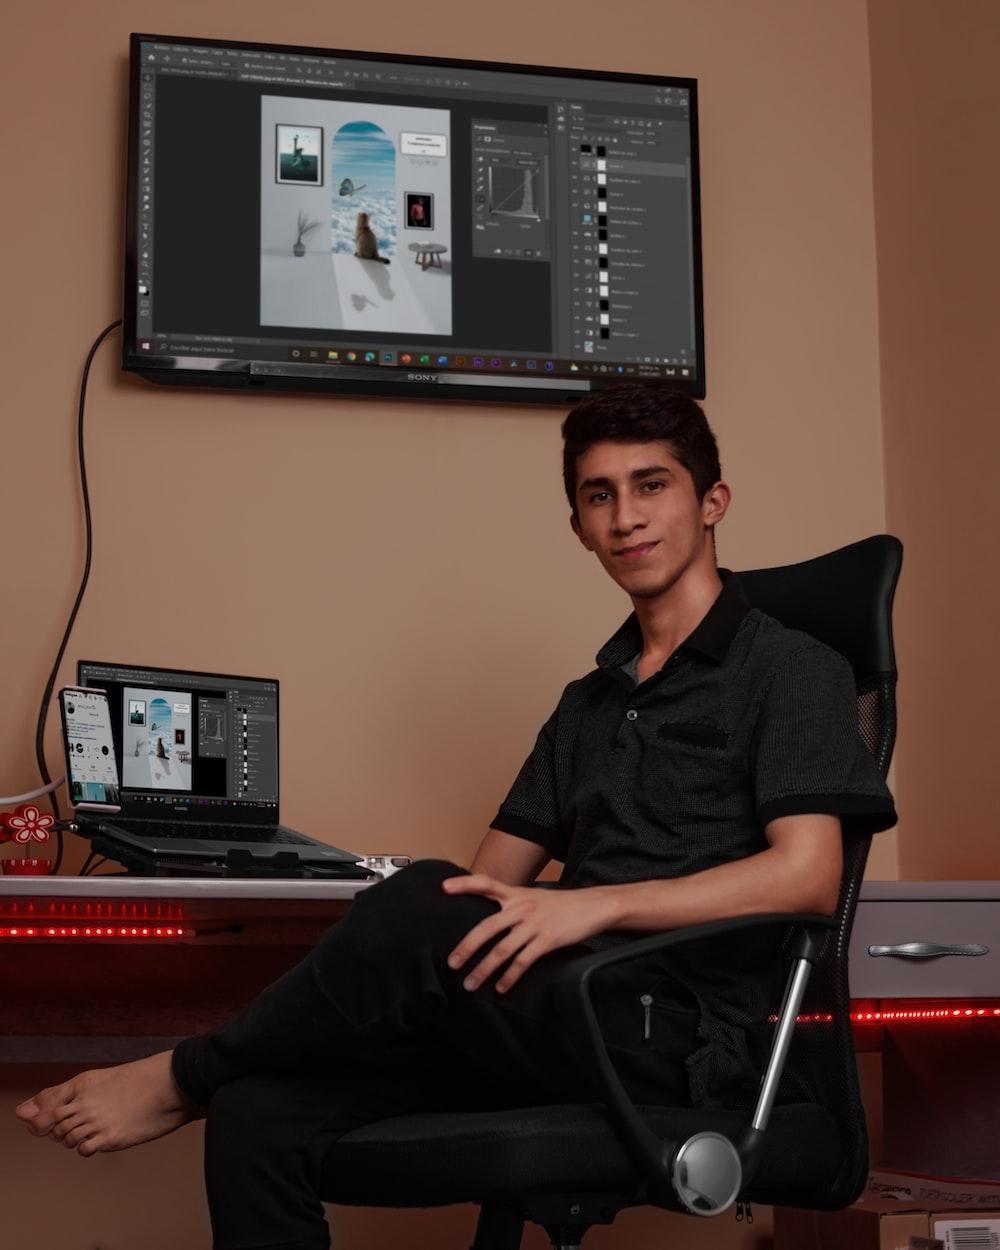 man in black dress shirt sitting on black office rolling chair